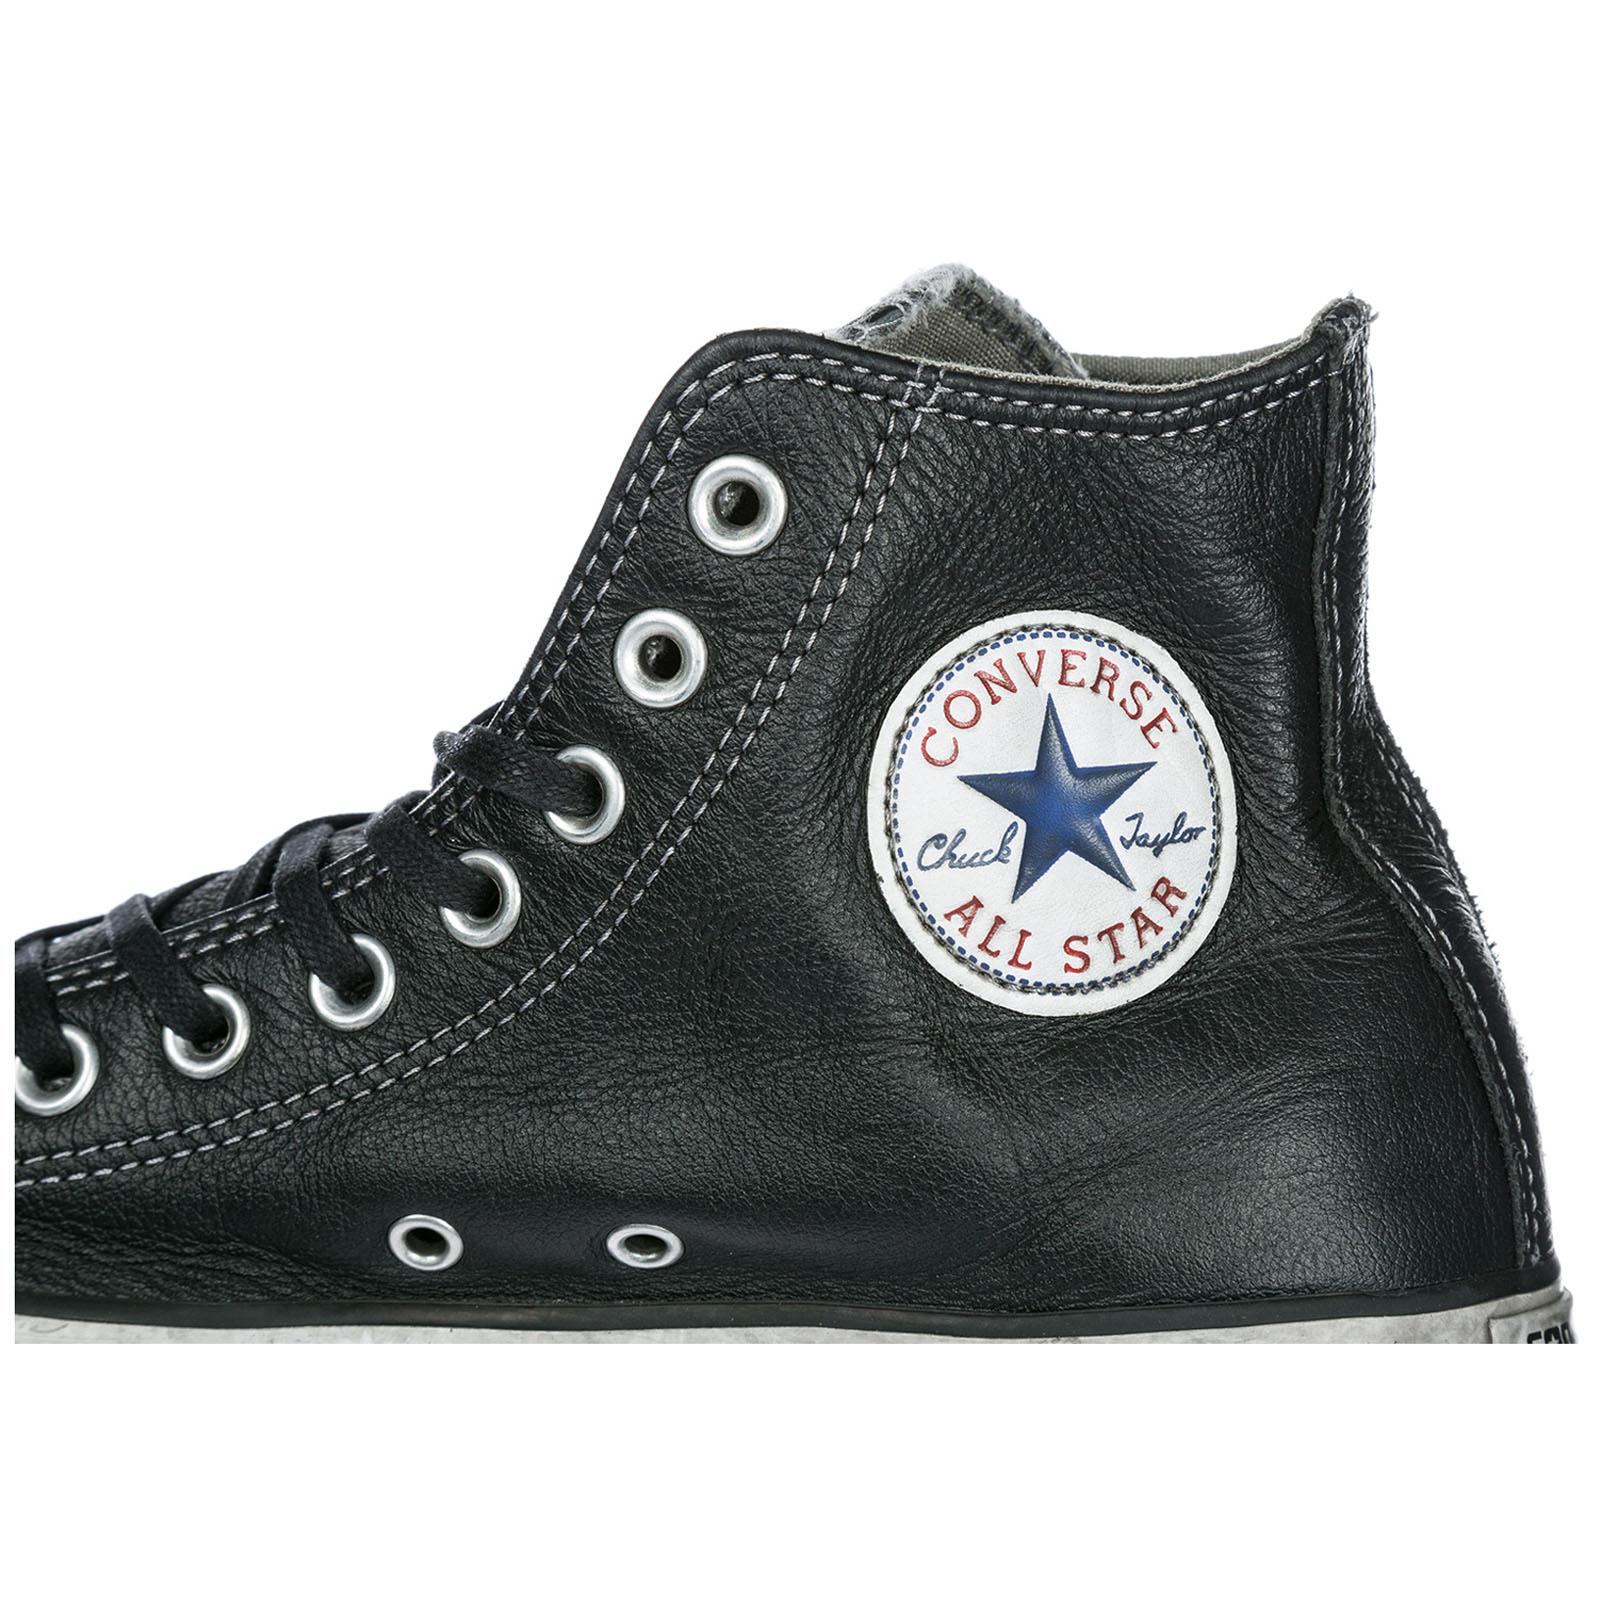 ... Chaussures baskets sneakers hautes homme en cuir limited edition 00ec4b00a1e